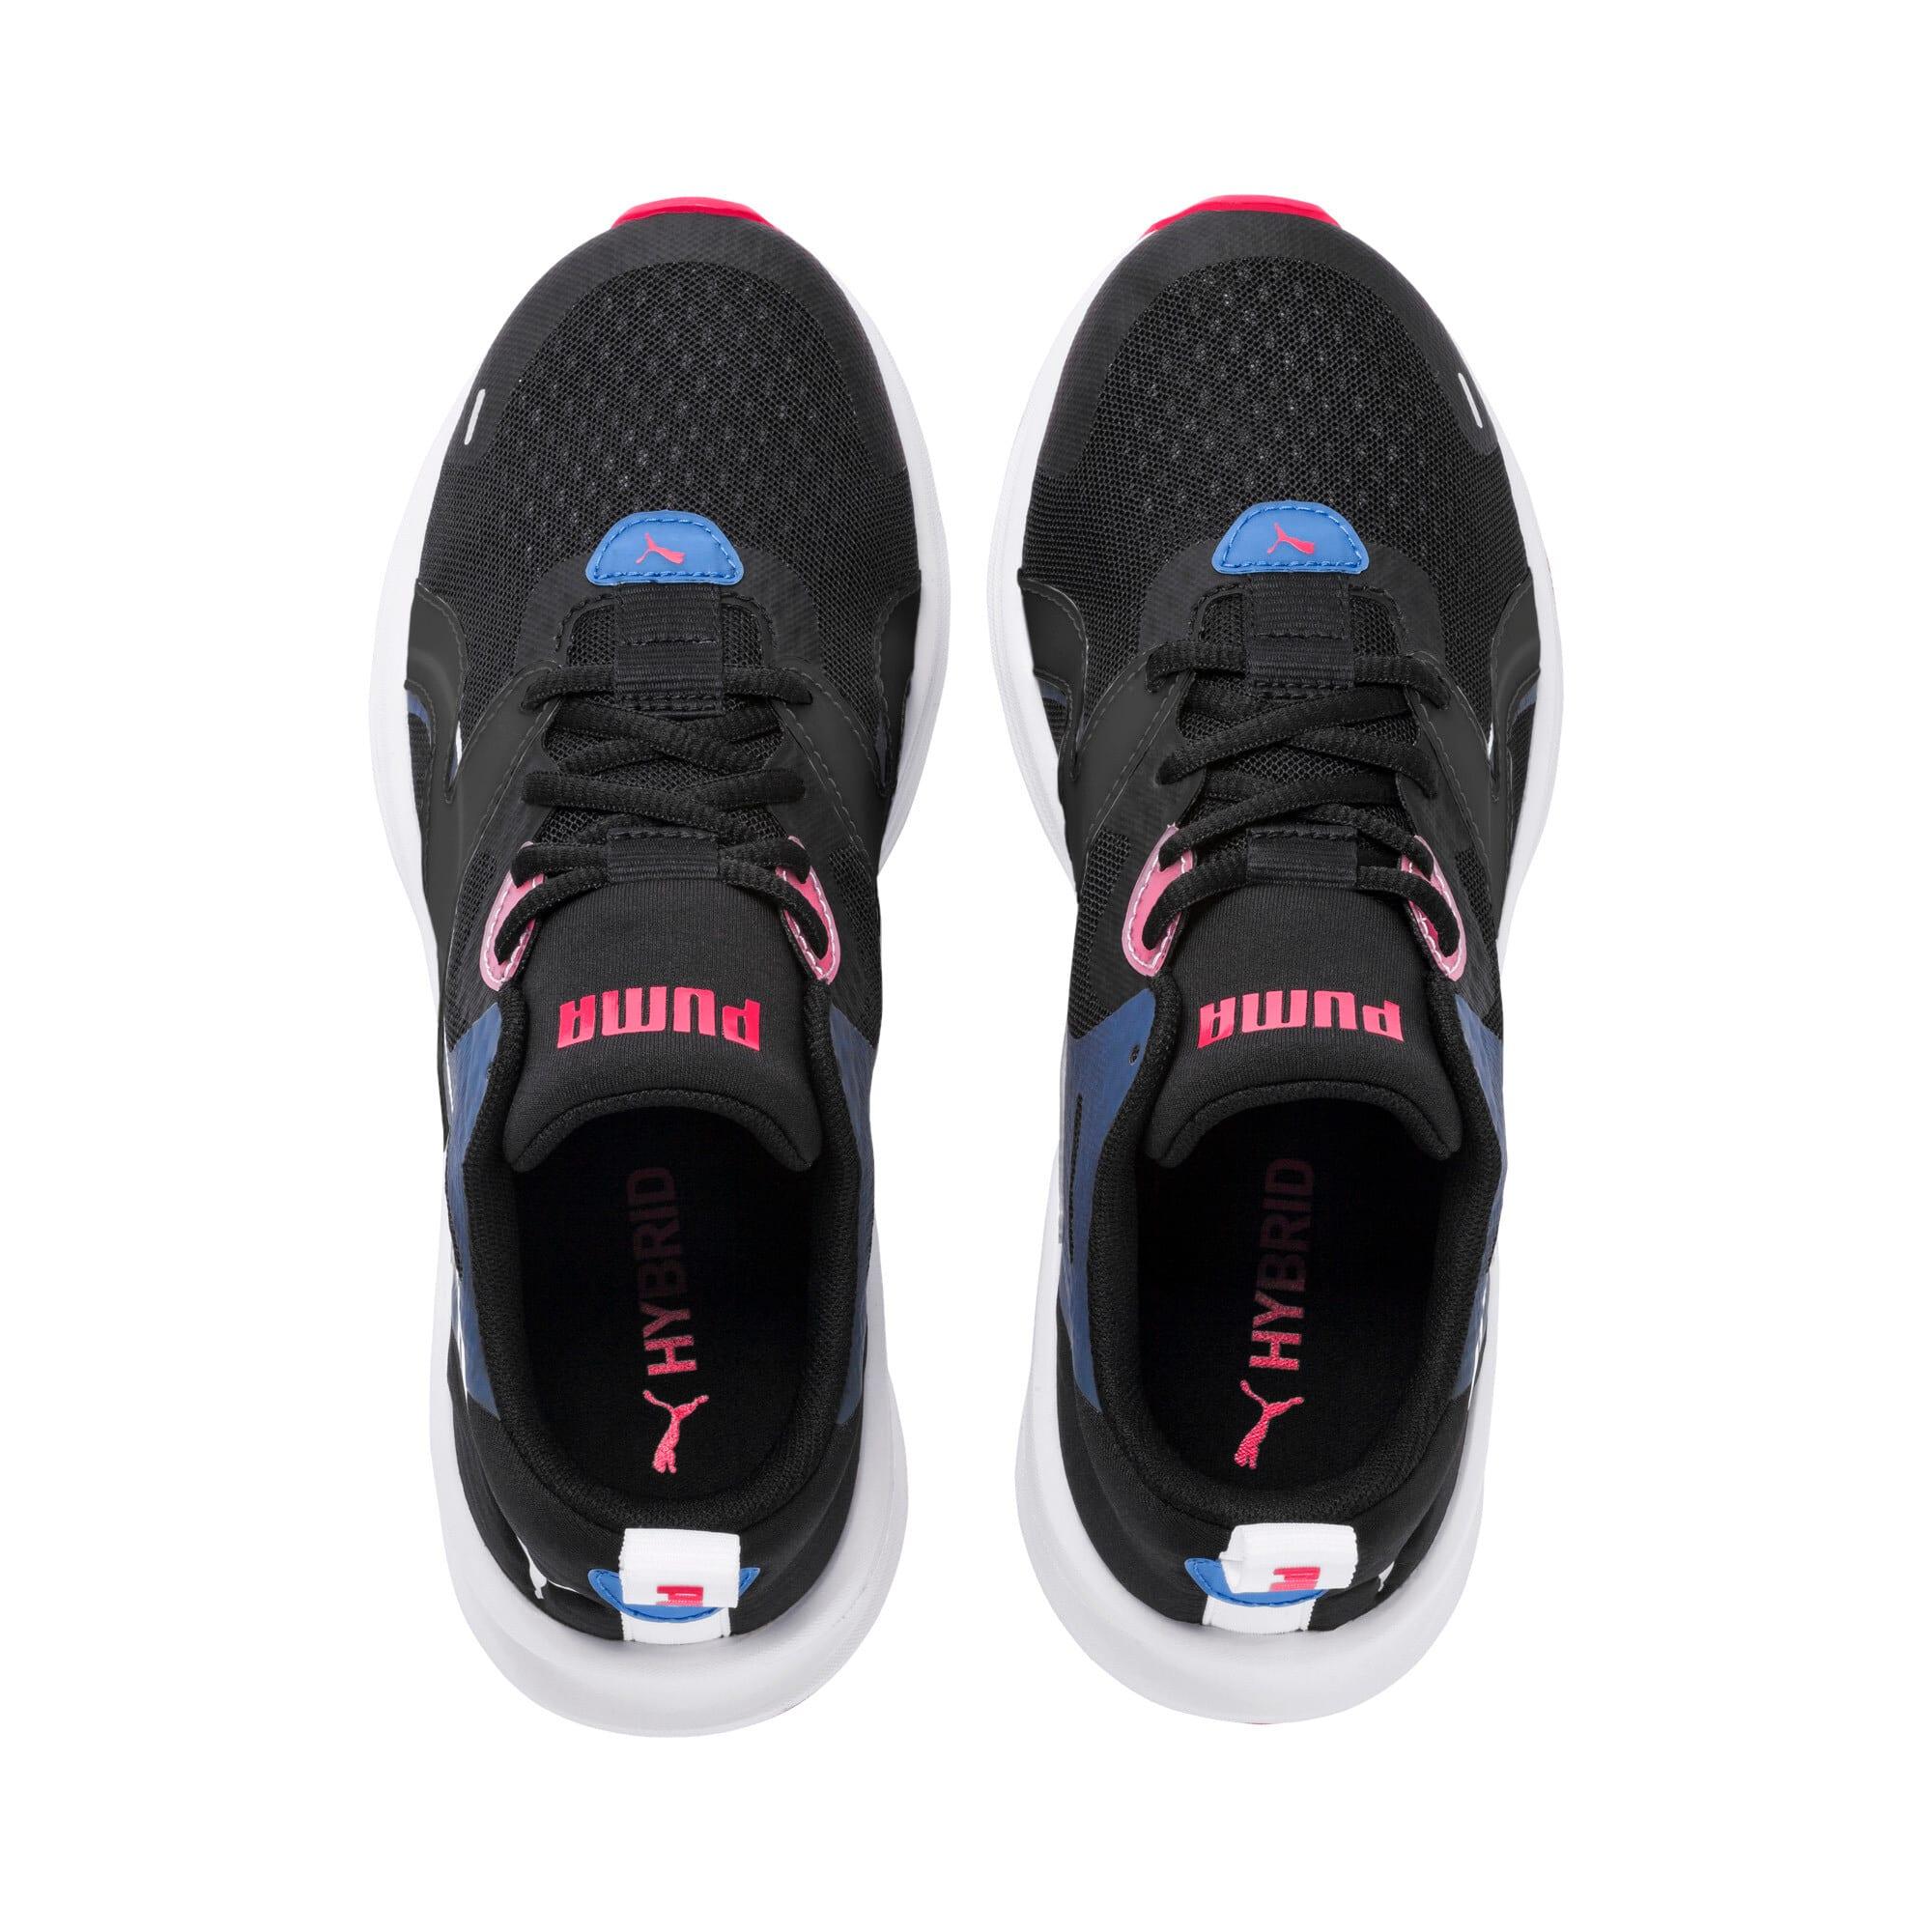 Thumbnail 7 of HYBRID Fuego Women's Running Shoes, Black-Blue Glimmer-Nrgy Rose, medium